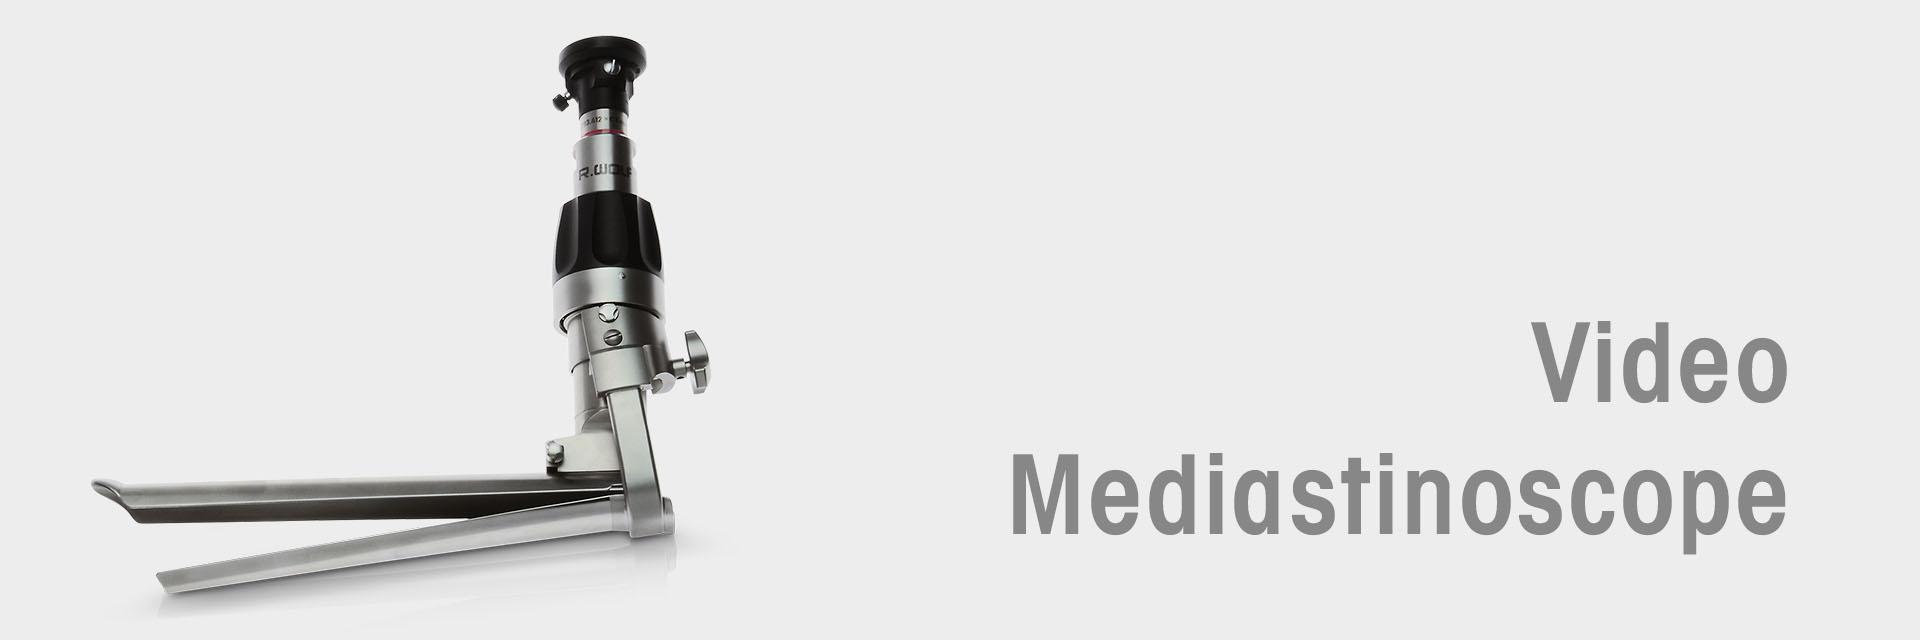 video mediastinoscope